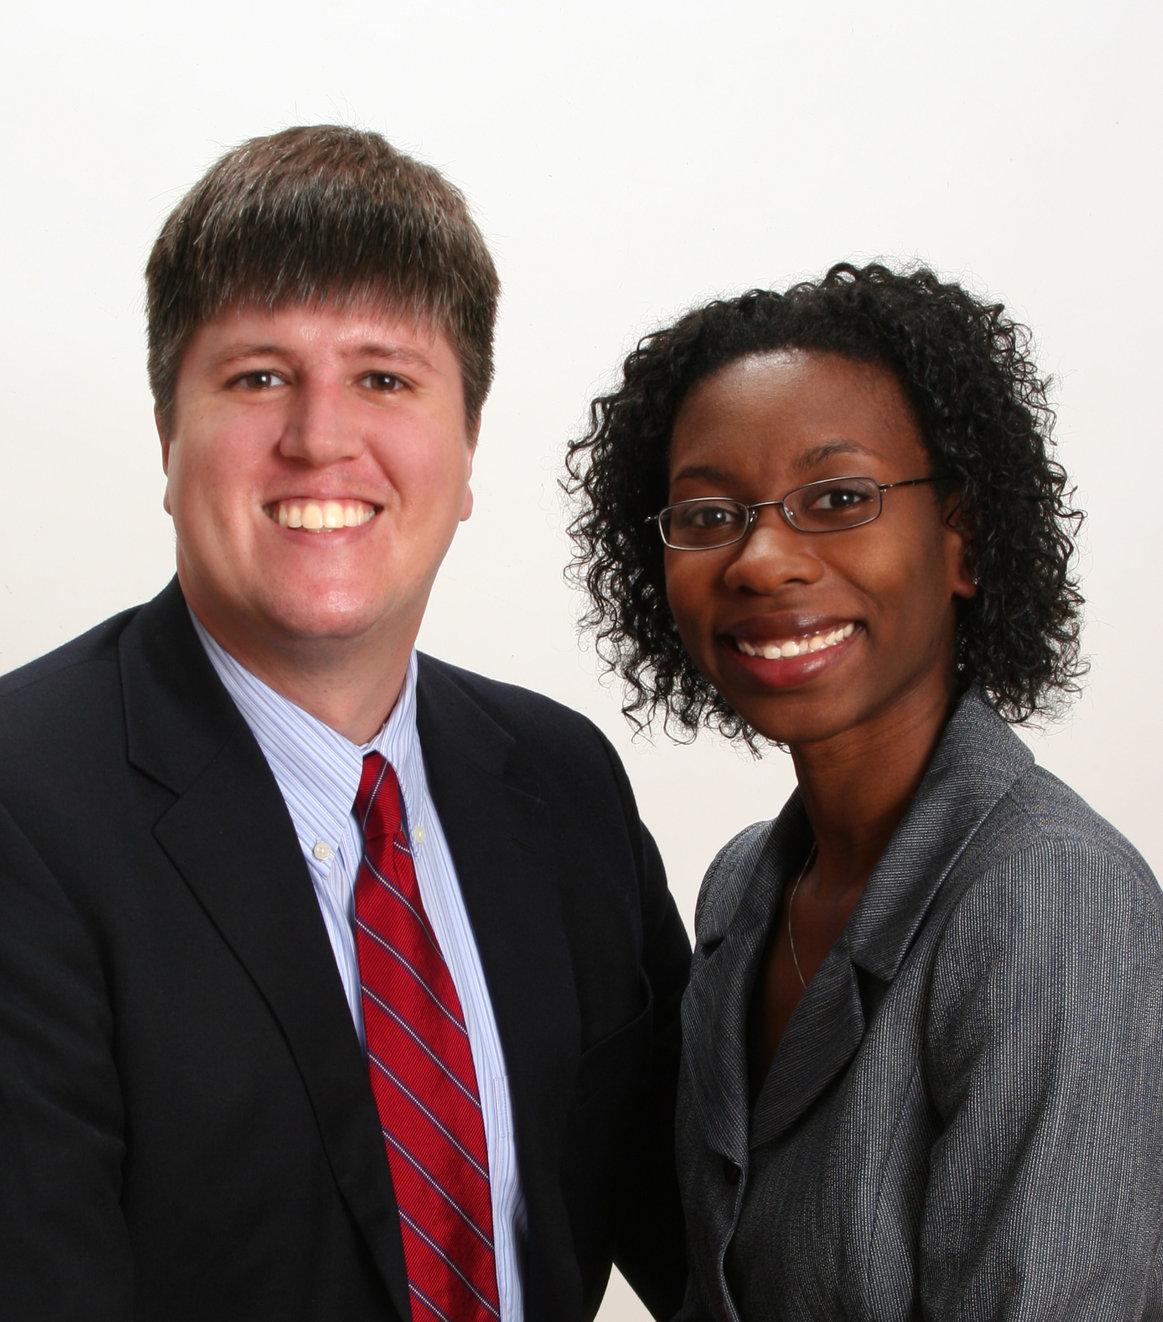 Bickerton & Bickerton, Attorneys at Law